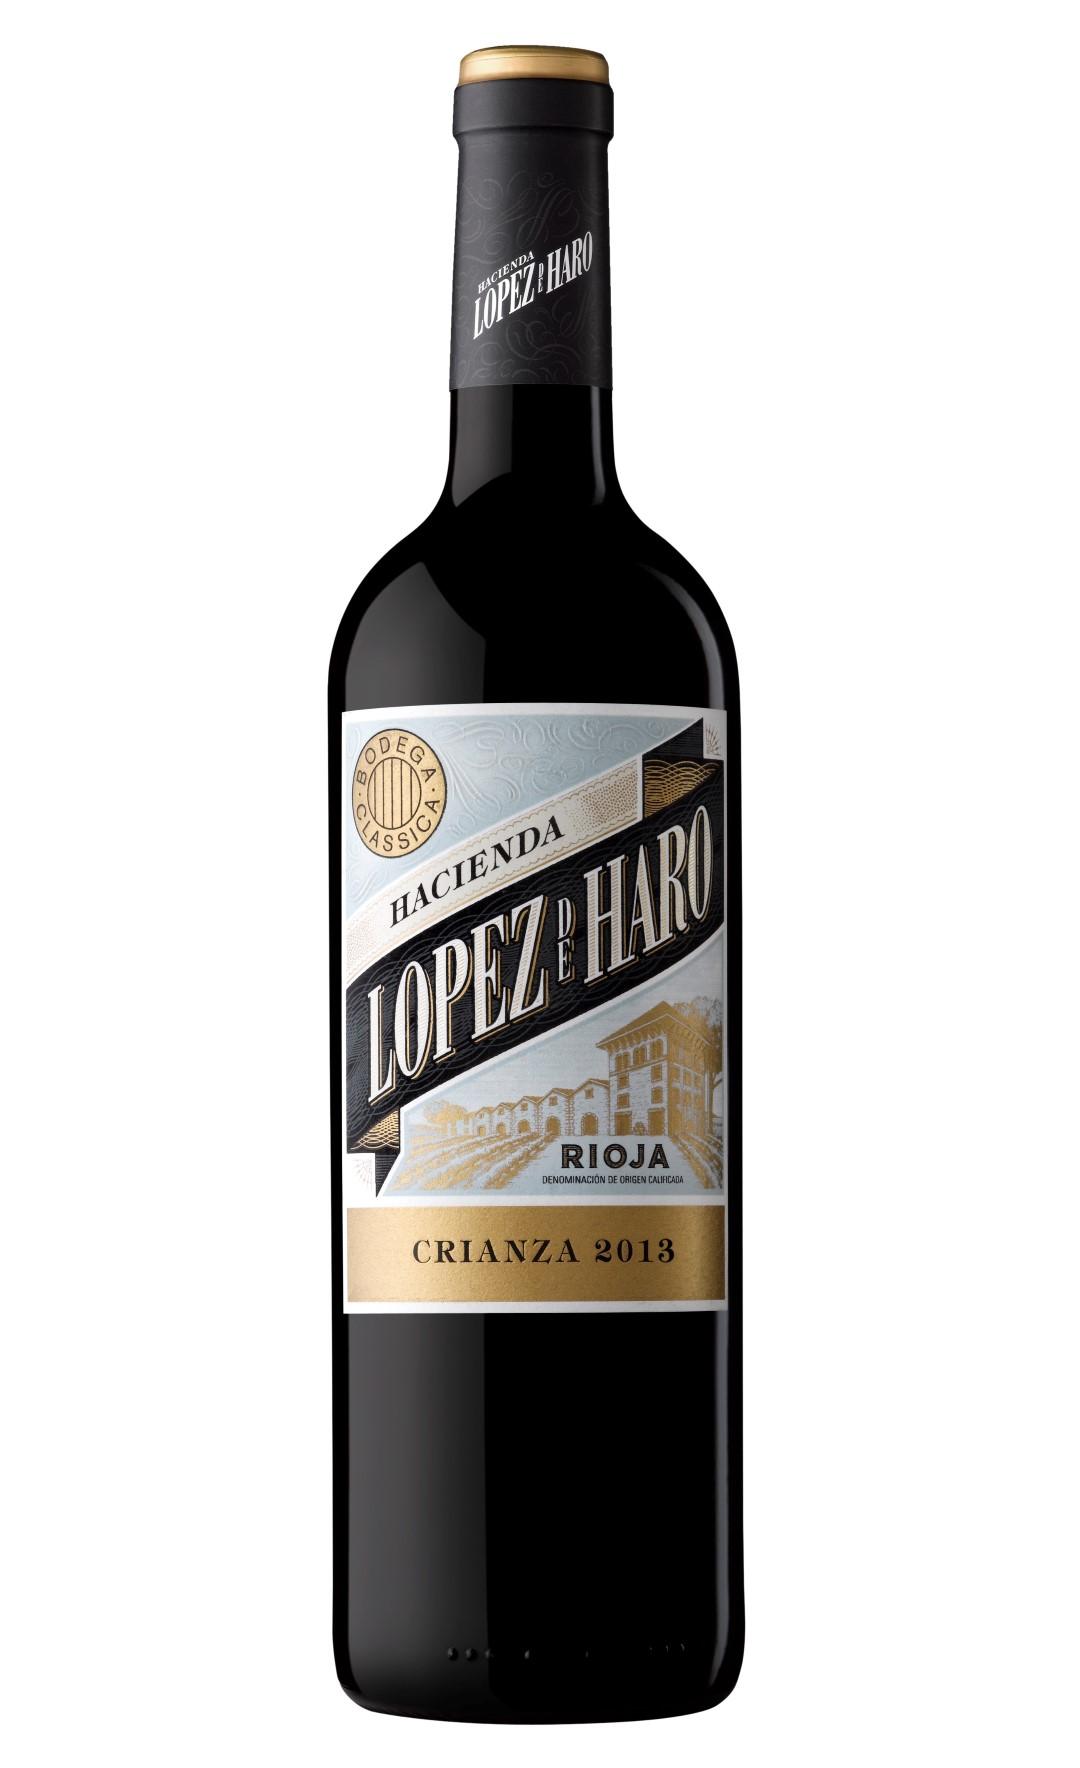 2013 Hacienda Lopez de Haro Rioja Crianza